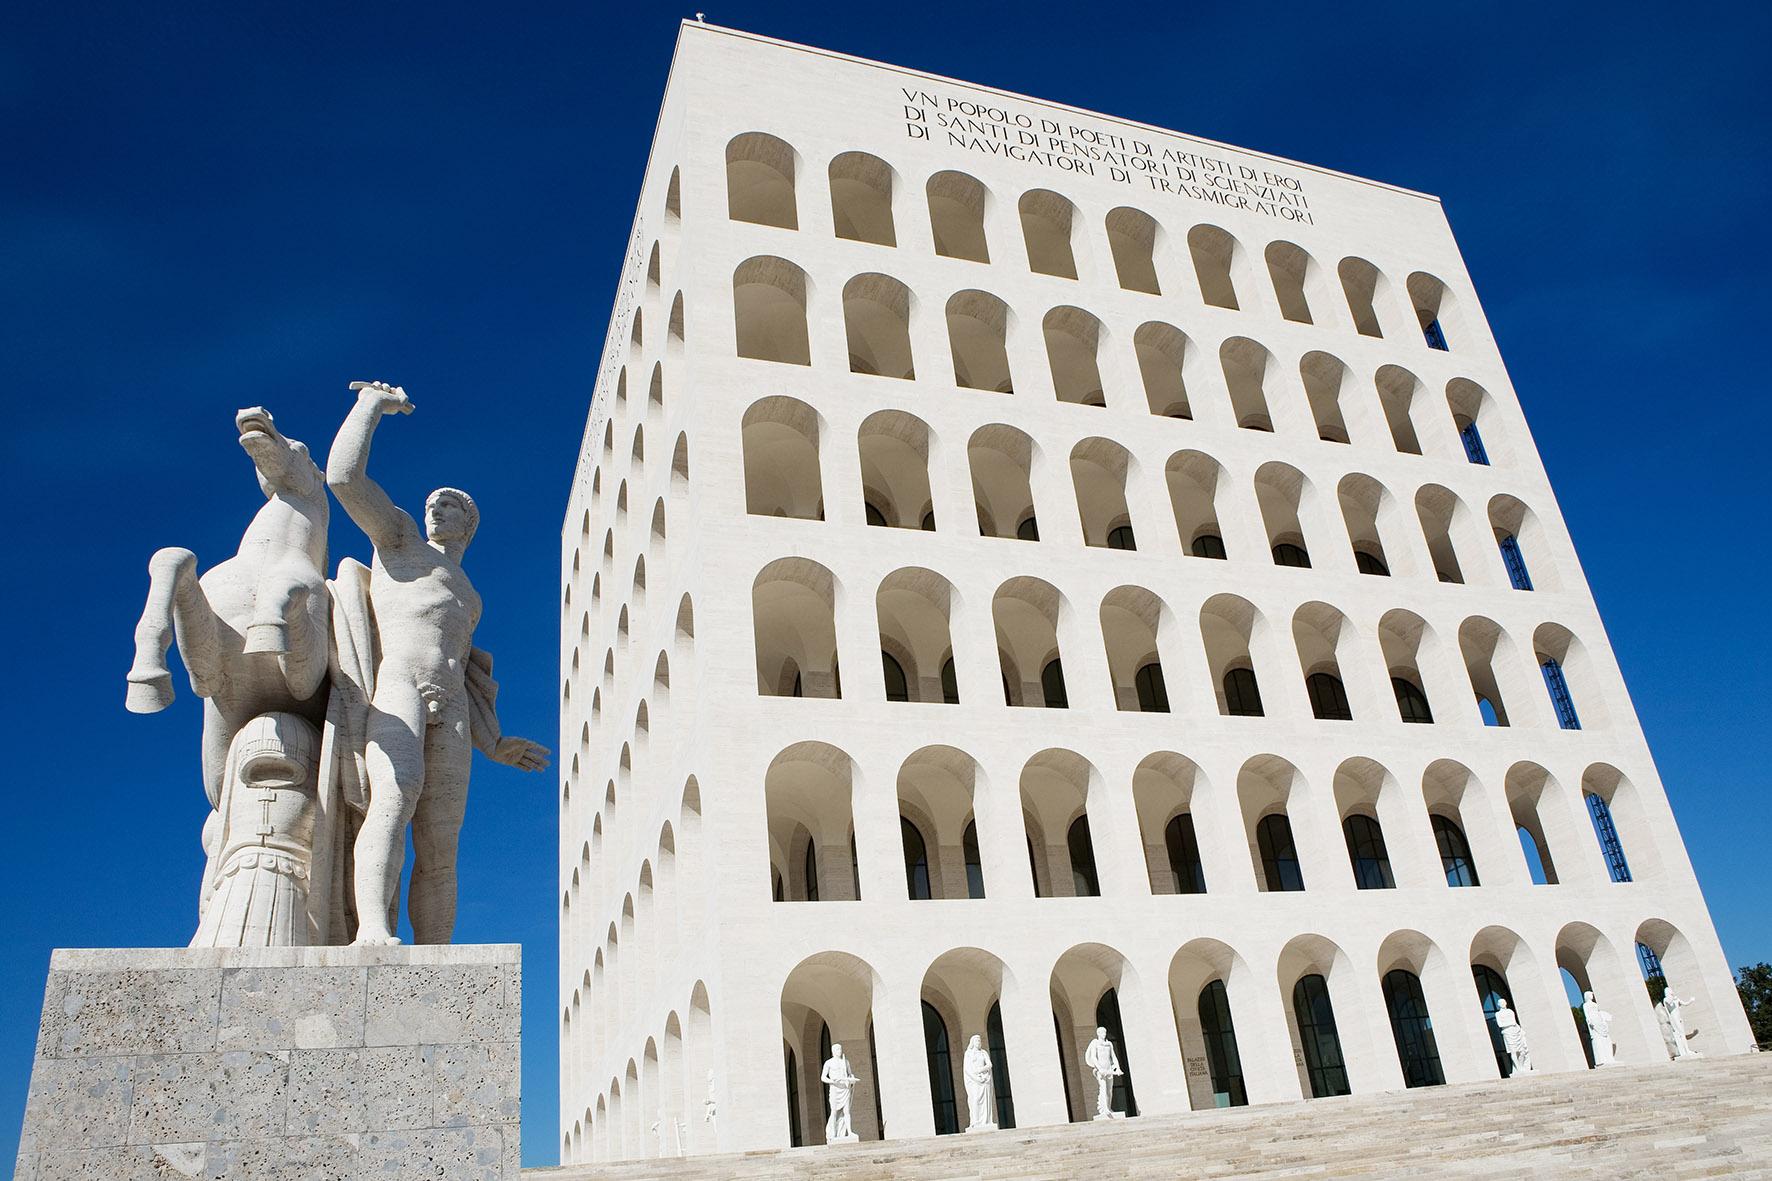 eur_palazzo-civilta-italiana